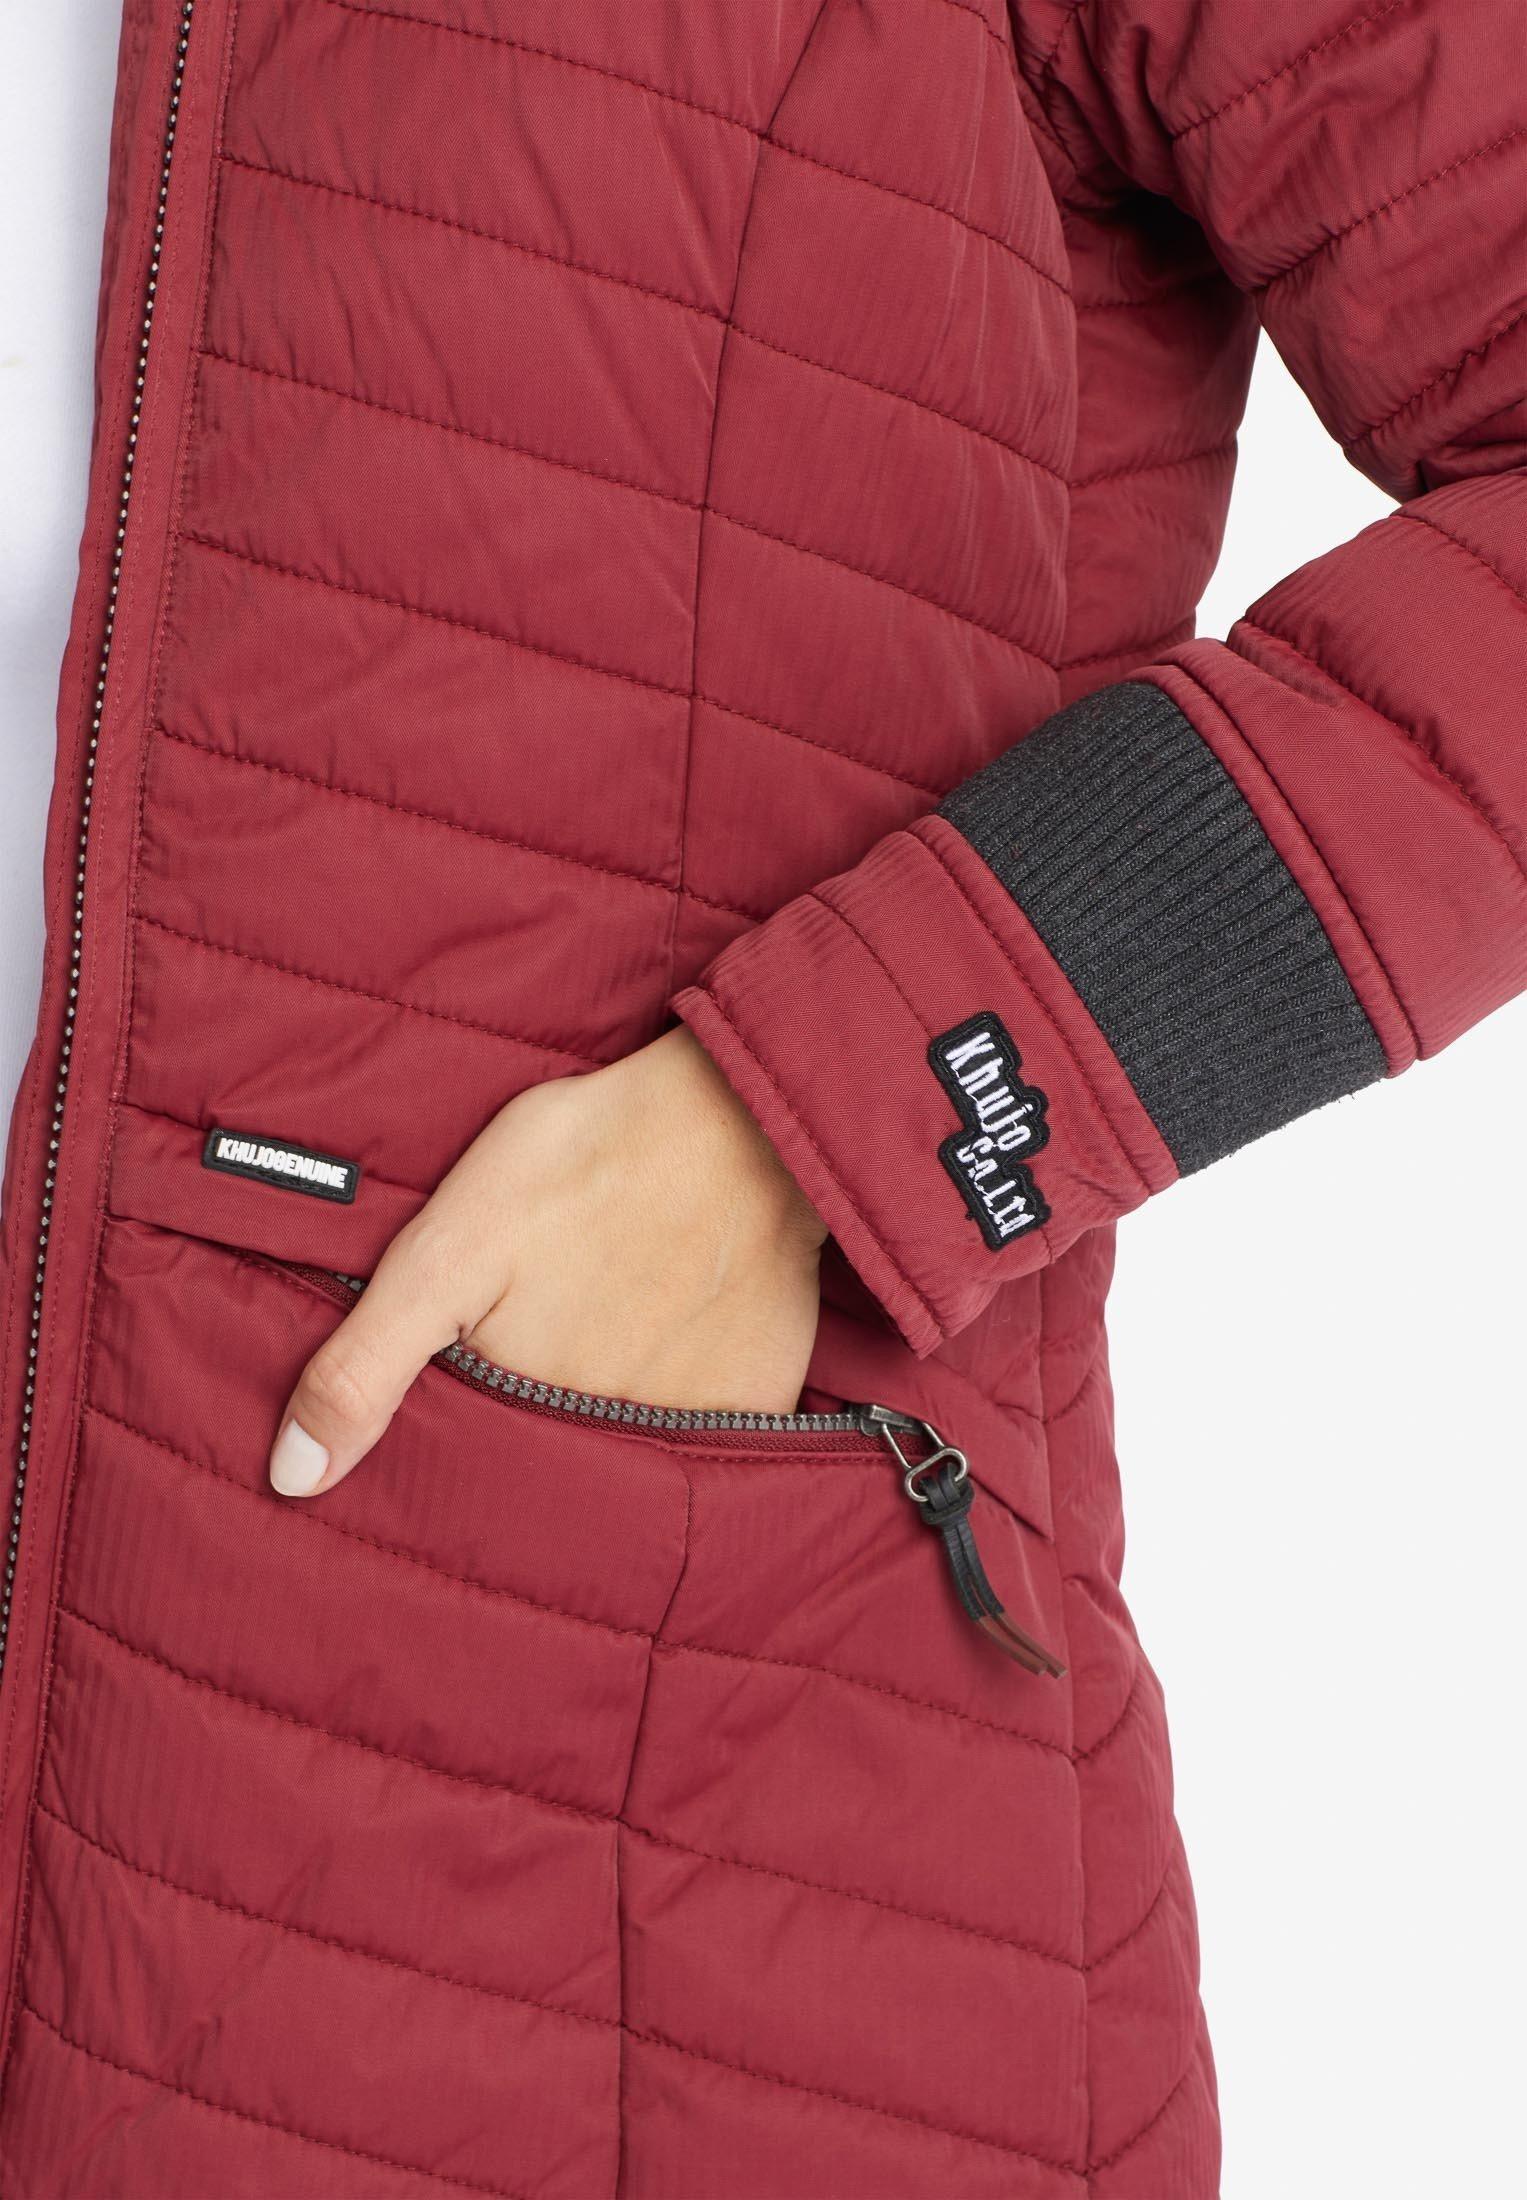 Khujo Toots - Winterjas Red h4ftEU31